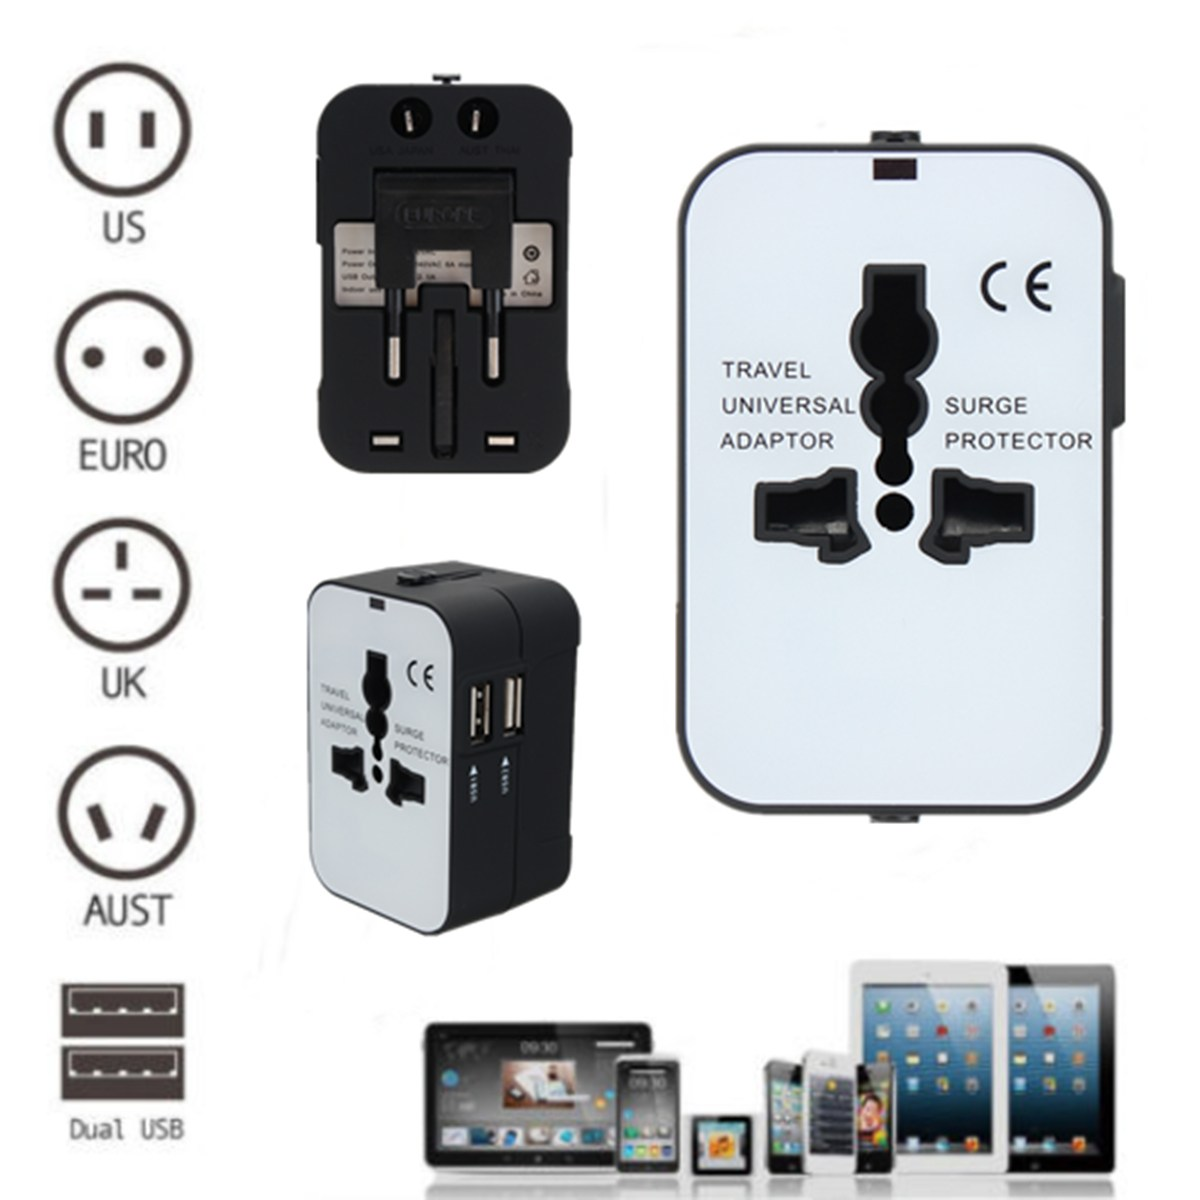 Universal Travel AC Power Adapter Converter Charger W/ Power Indicator Light 2 USB Port